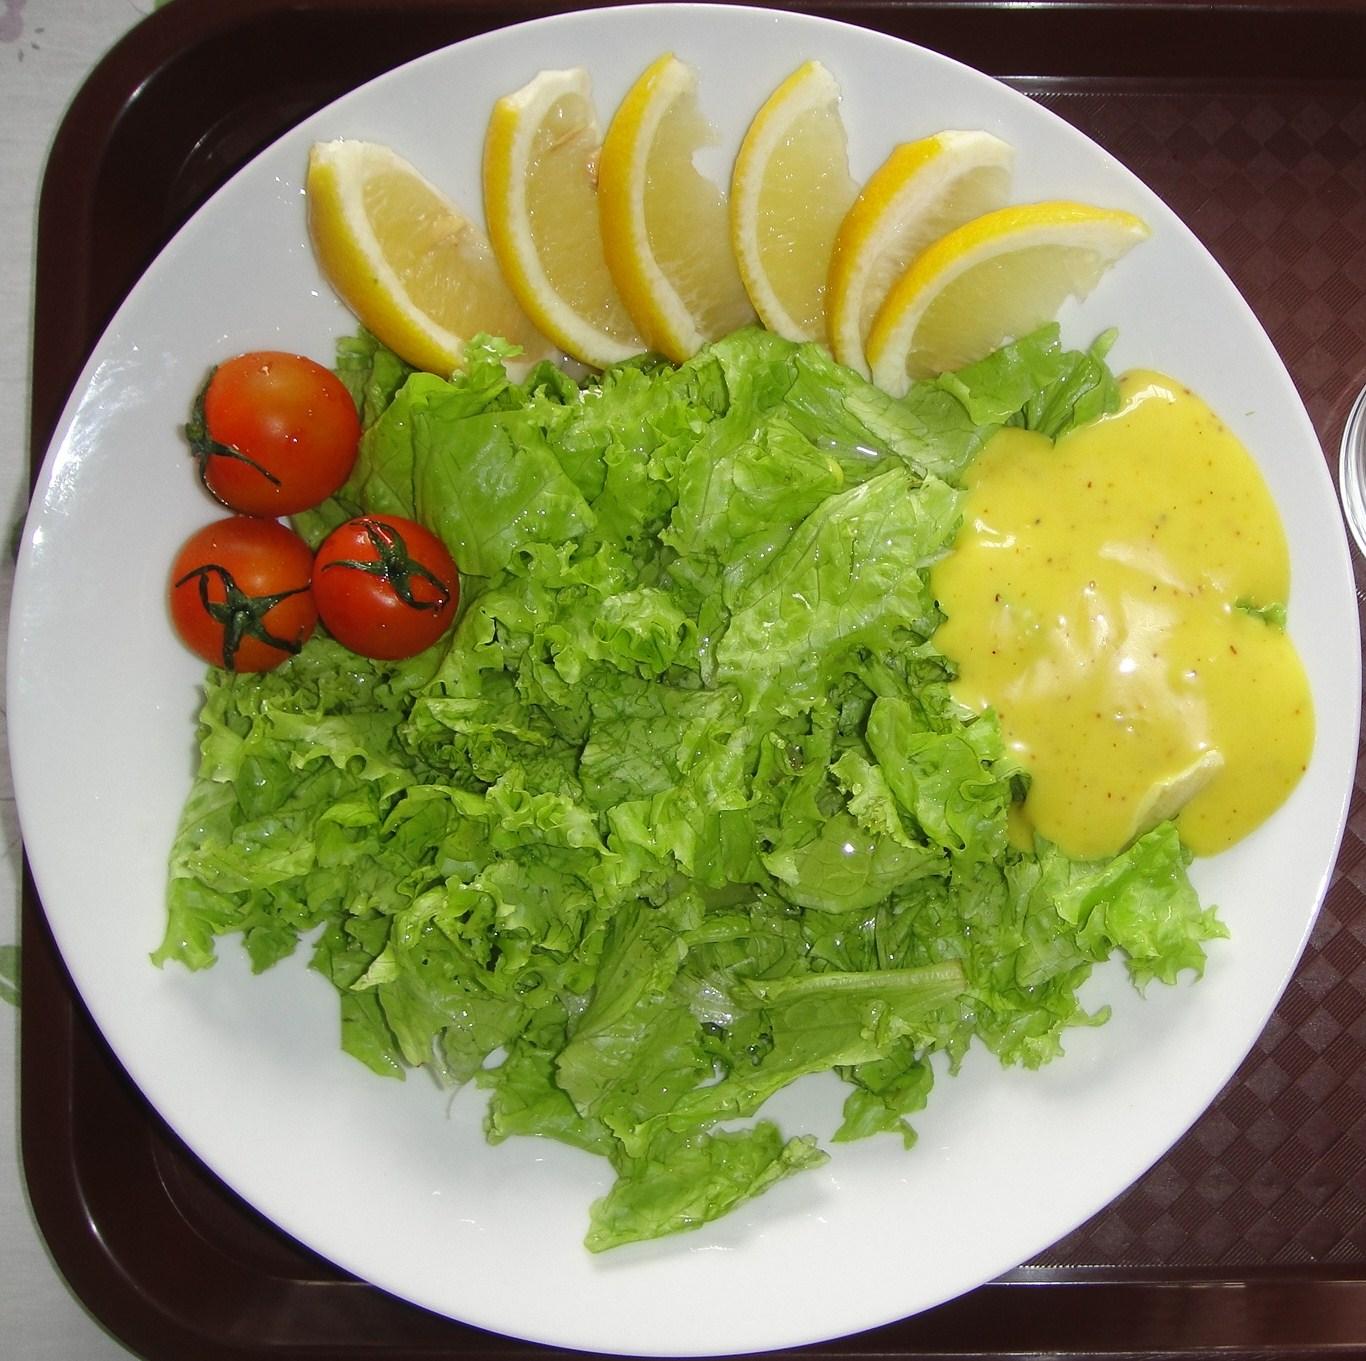 Lettuce Salad with Honey Mustard Dressing | Jazee's Microblog